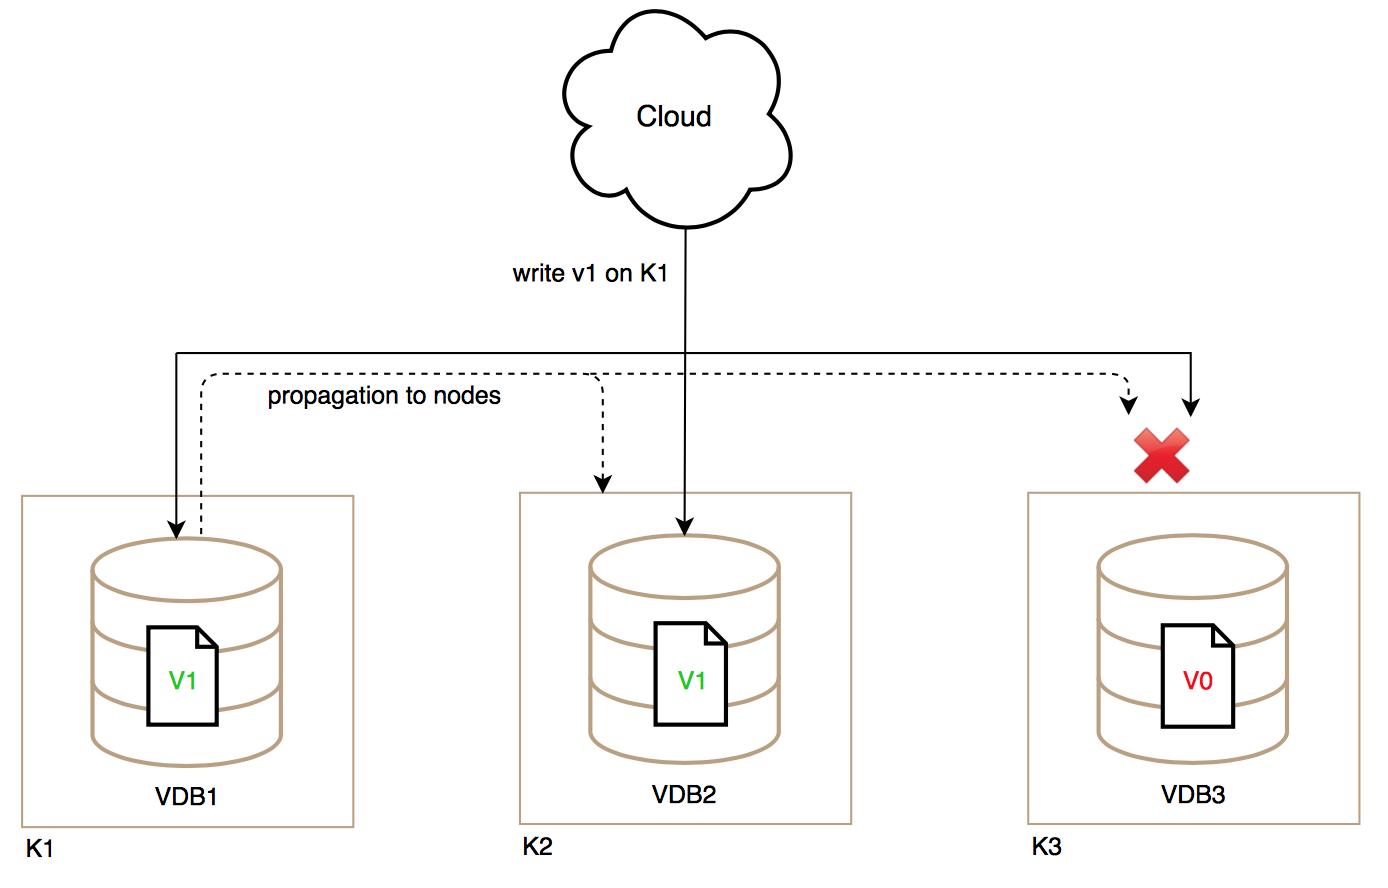 Knotenausfall von NoSQL-Datenbanken in der Cloud-Umgebung